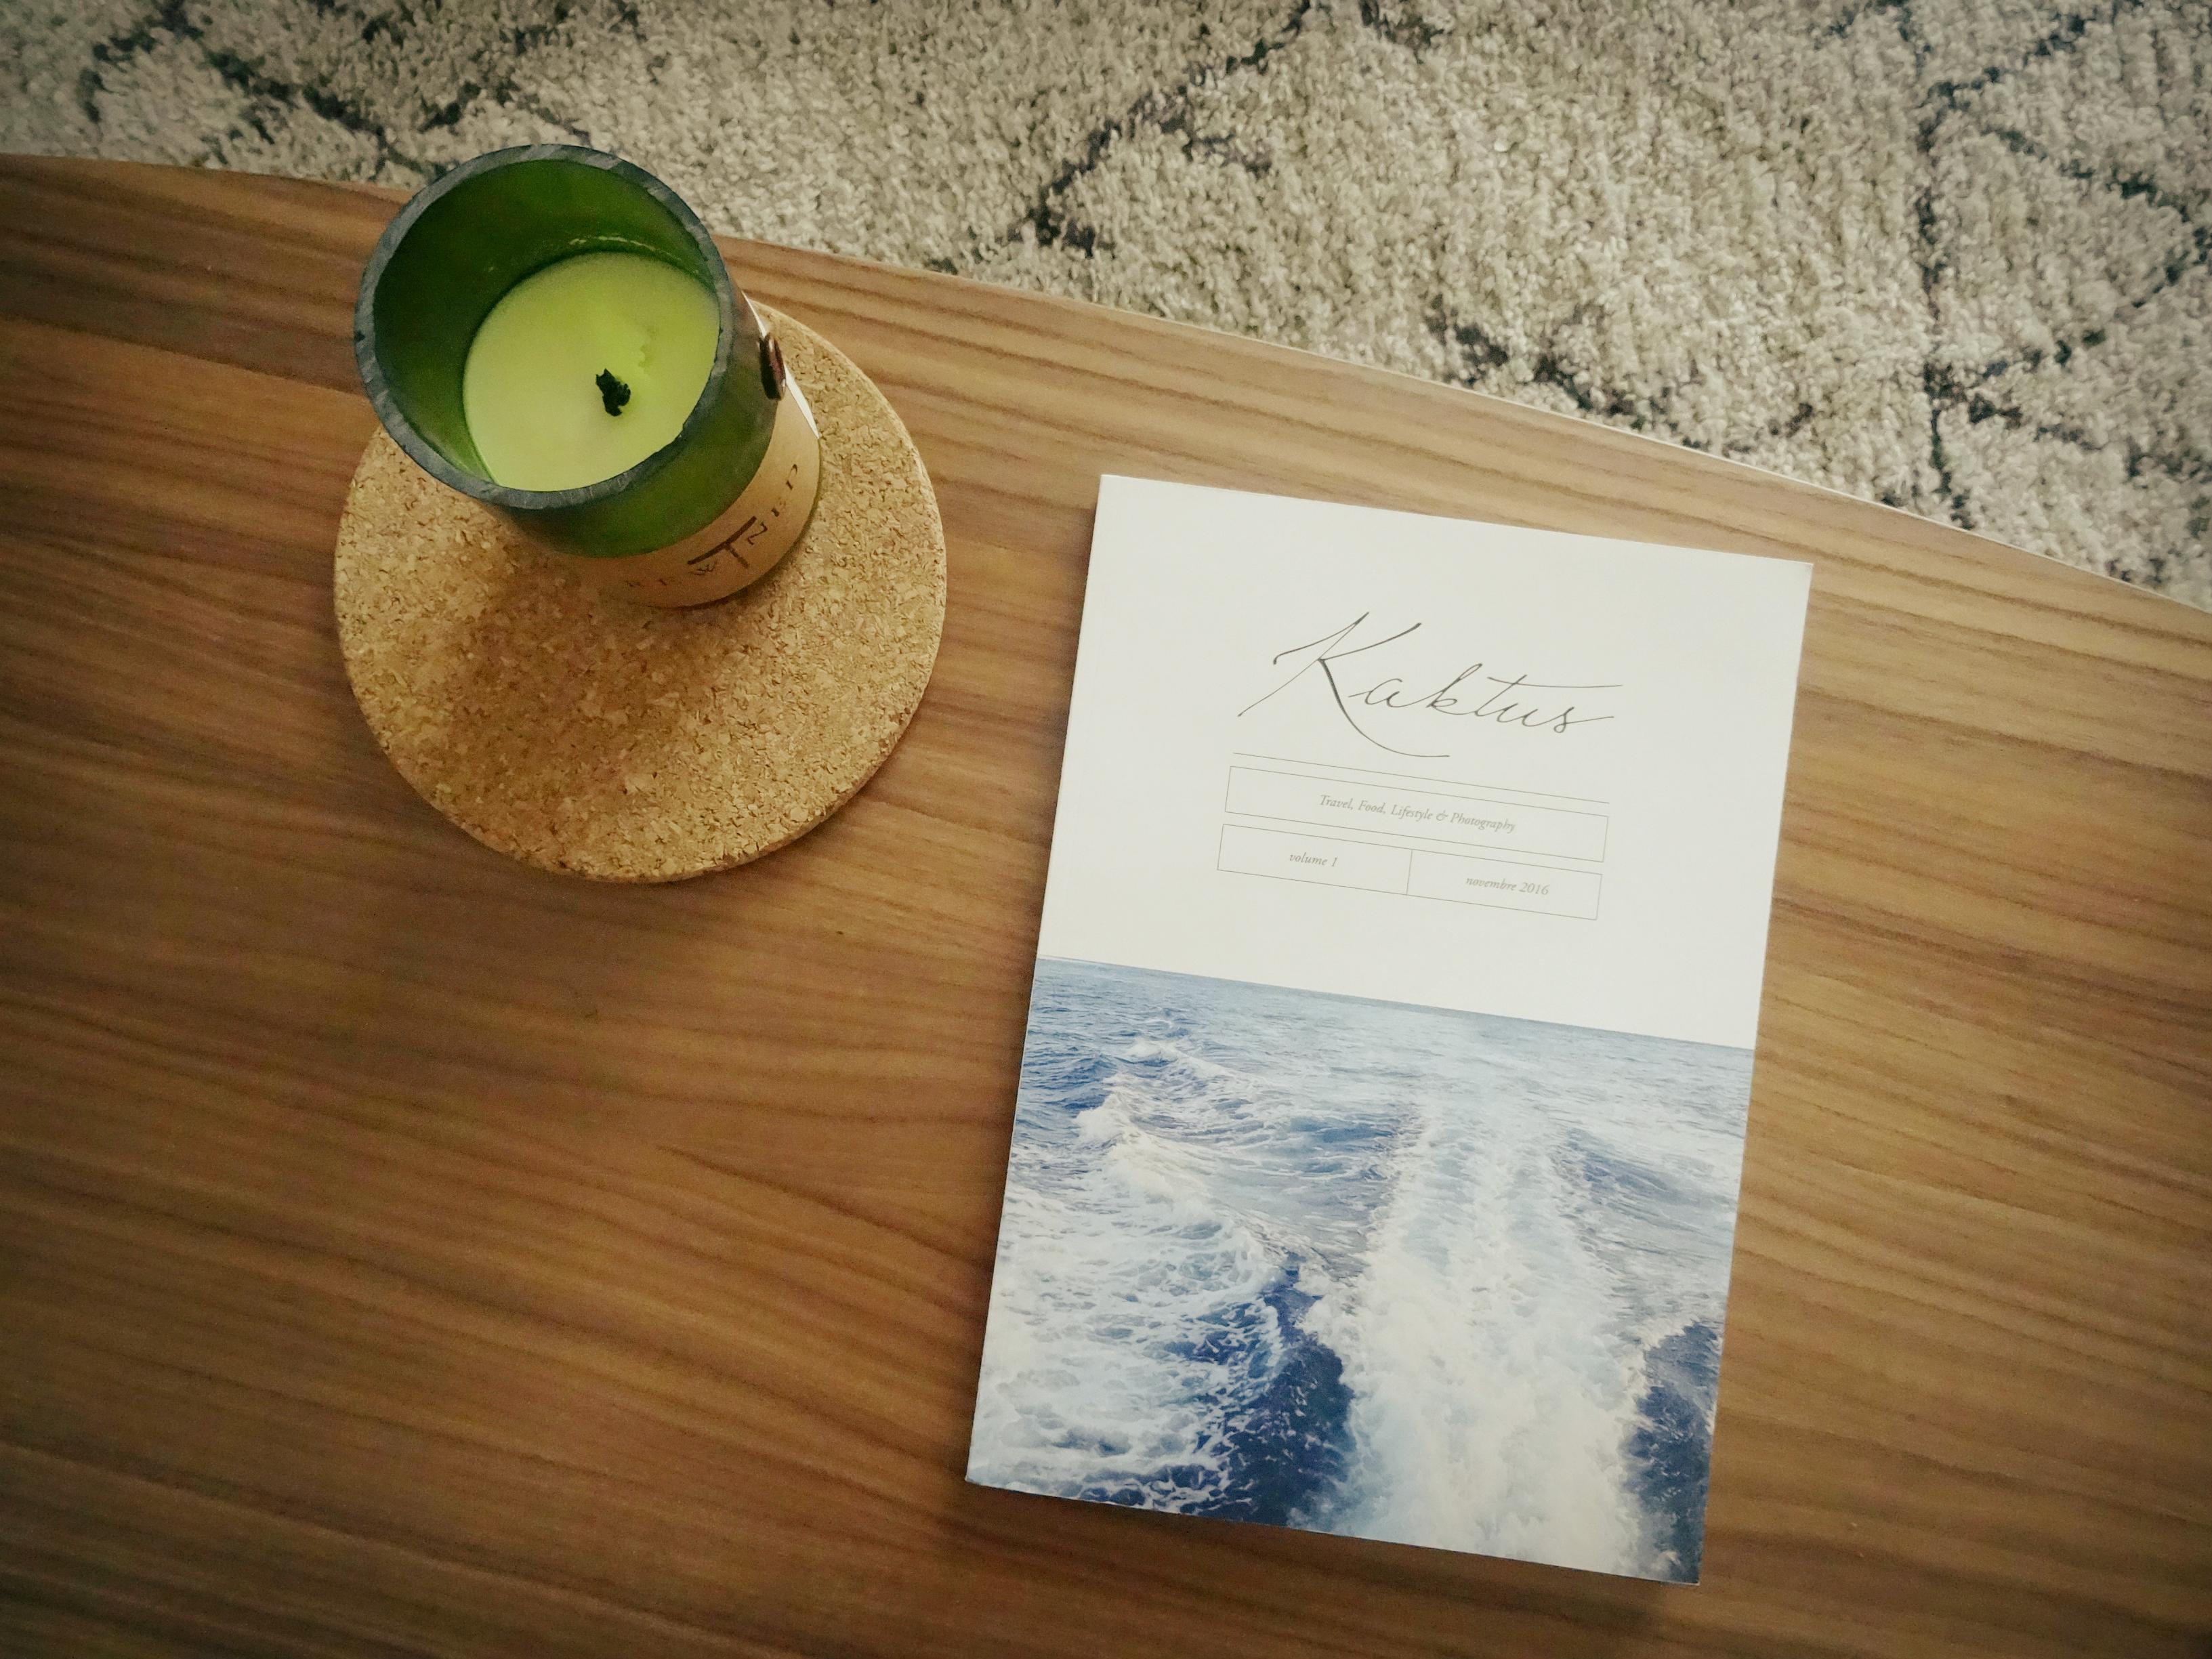 Kaktus Magazine